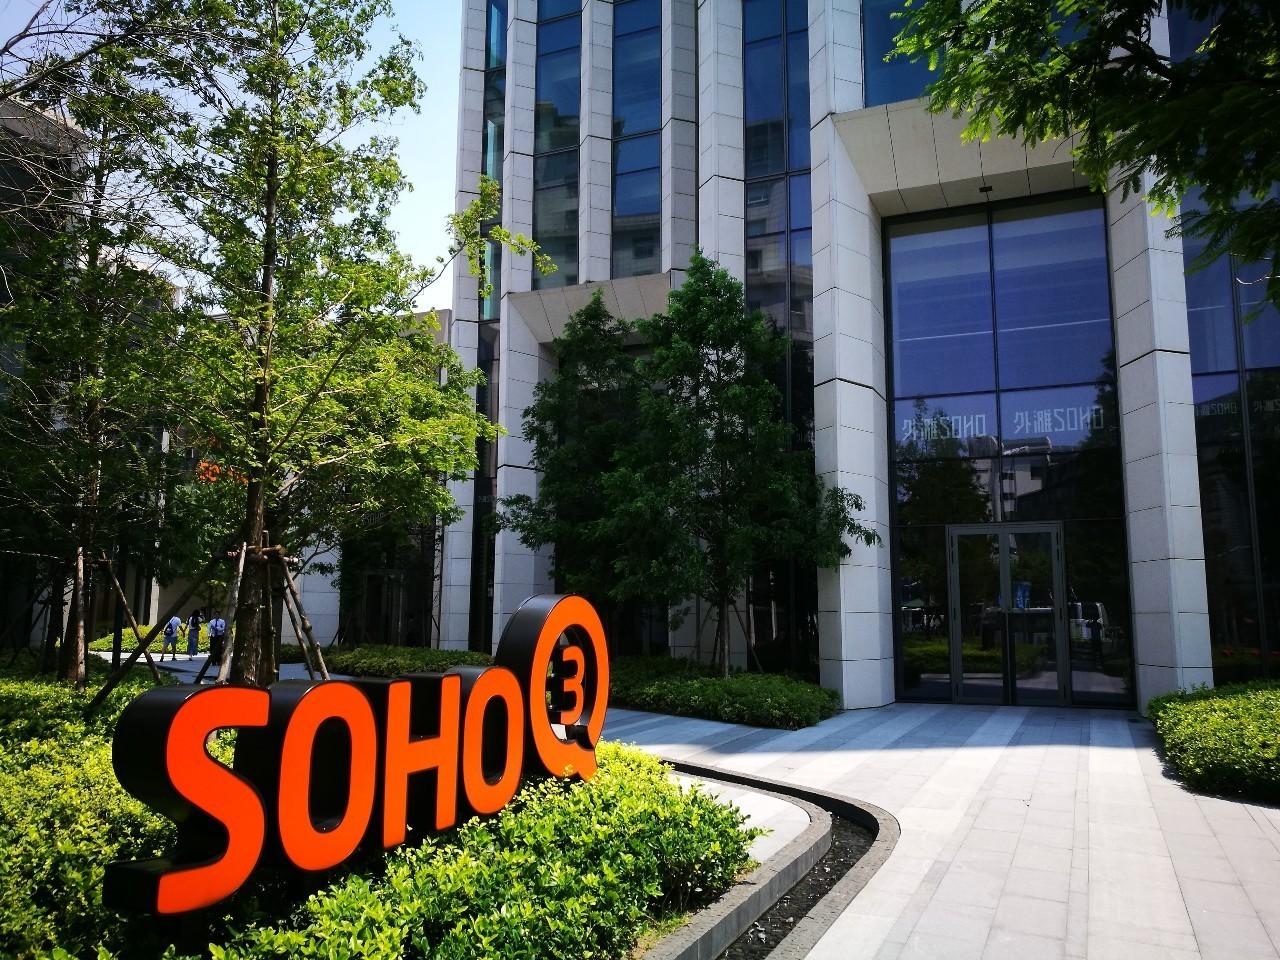 SOHO中国4年出售超5个地产项目 套现或达340亿